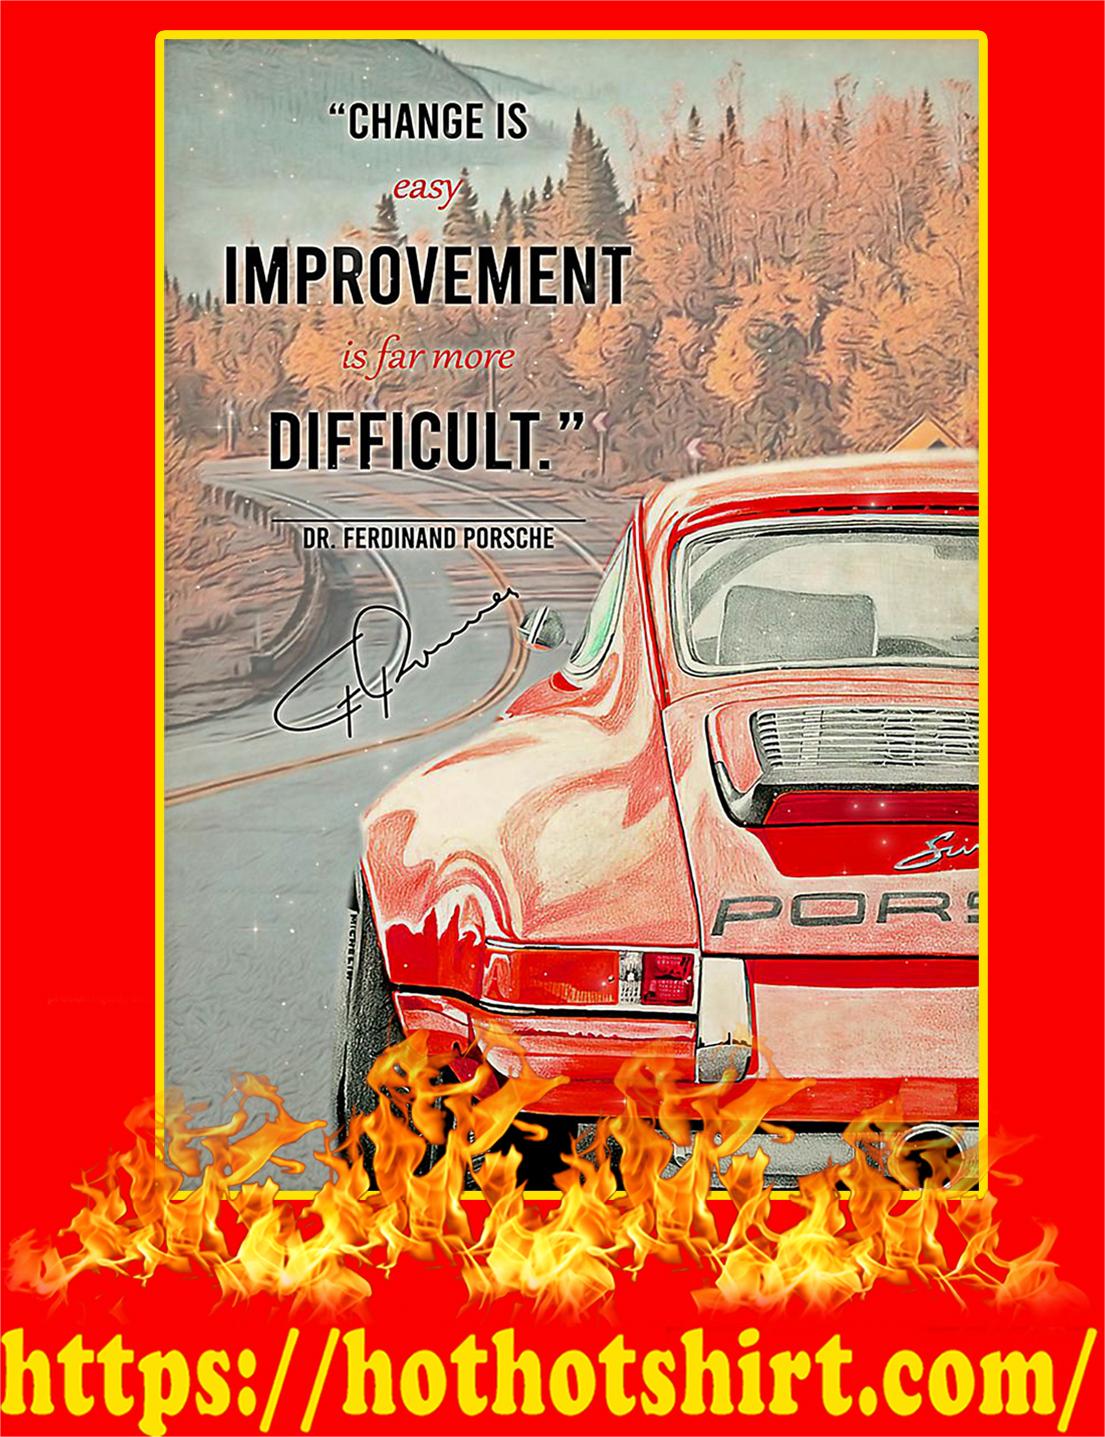 Change Is Easy Improvement Is Far More Difficult Dr Ferdinand Porsche Signature Poster - A3